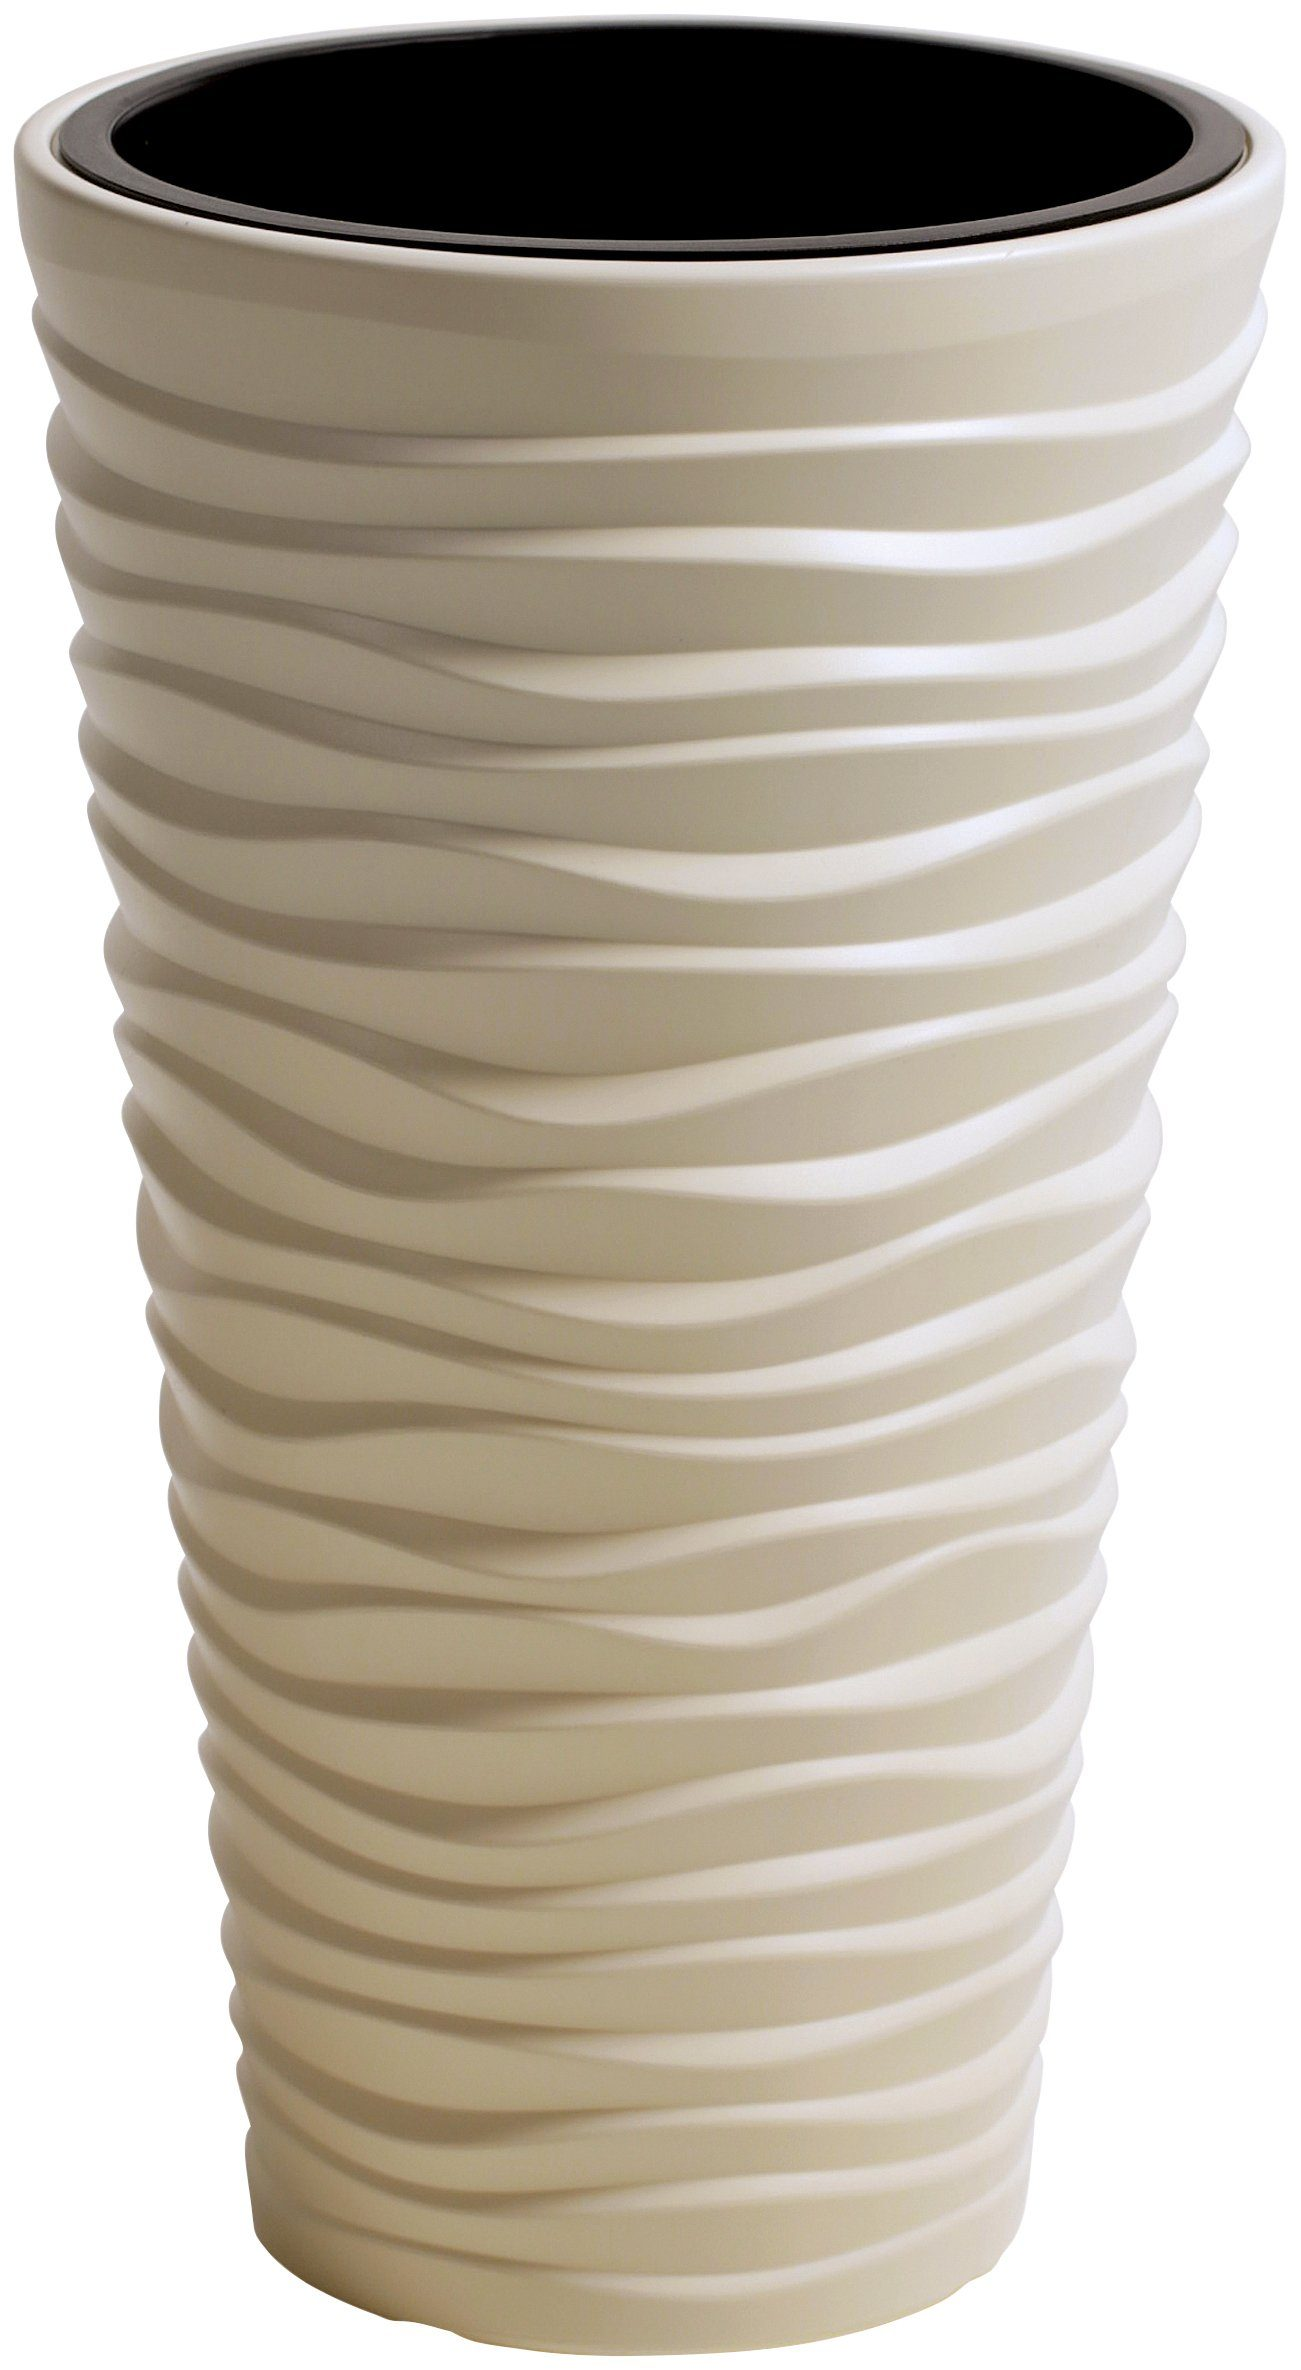 PROSPERPLAST Blumentopf »Sand slim«, creme, Ø 29,6